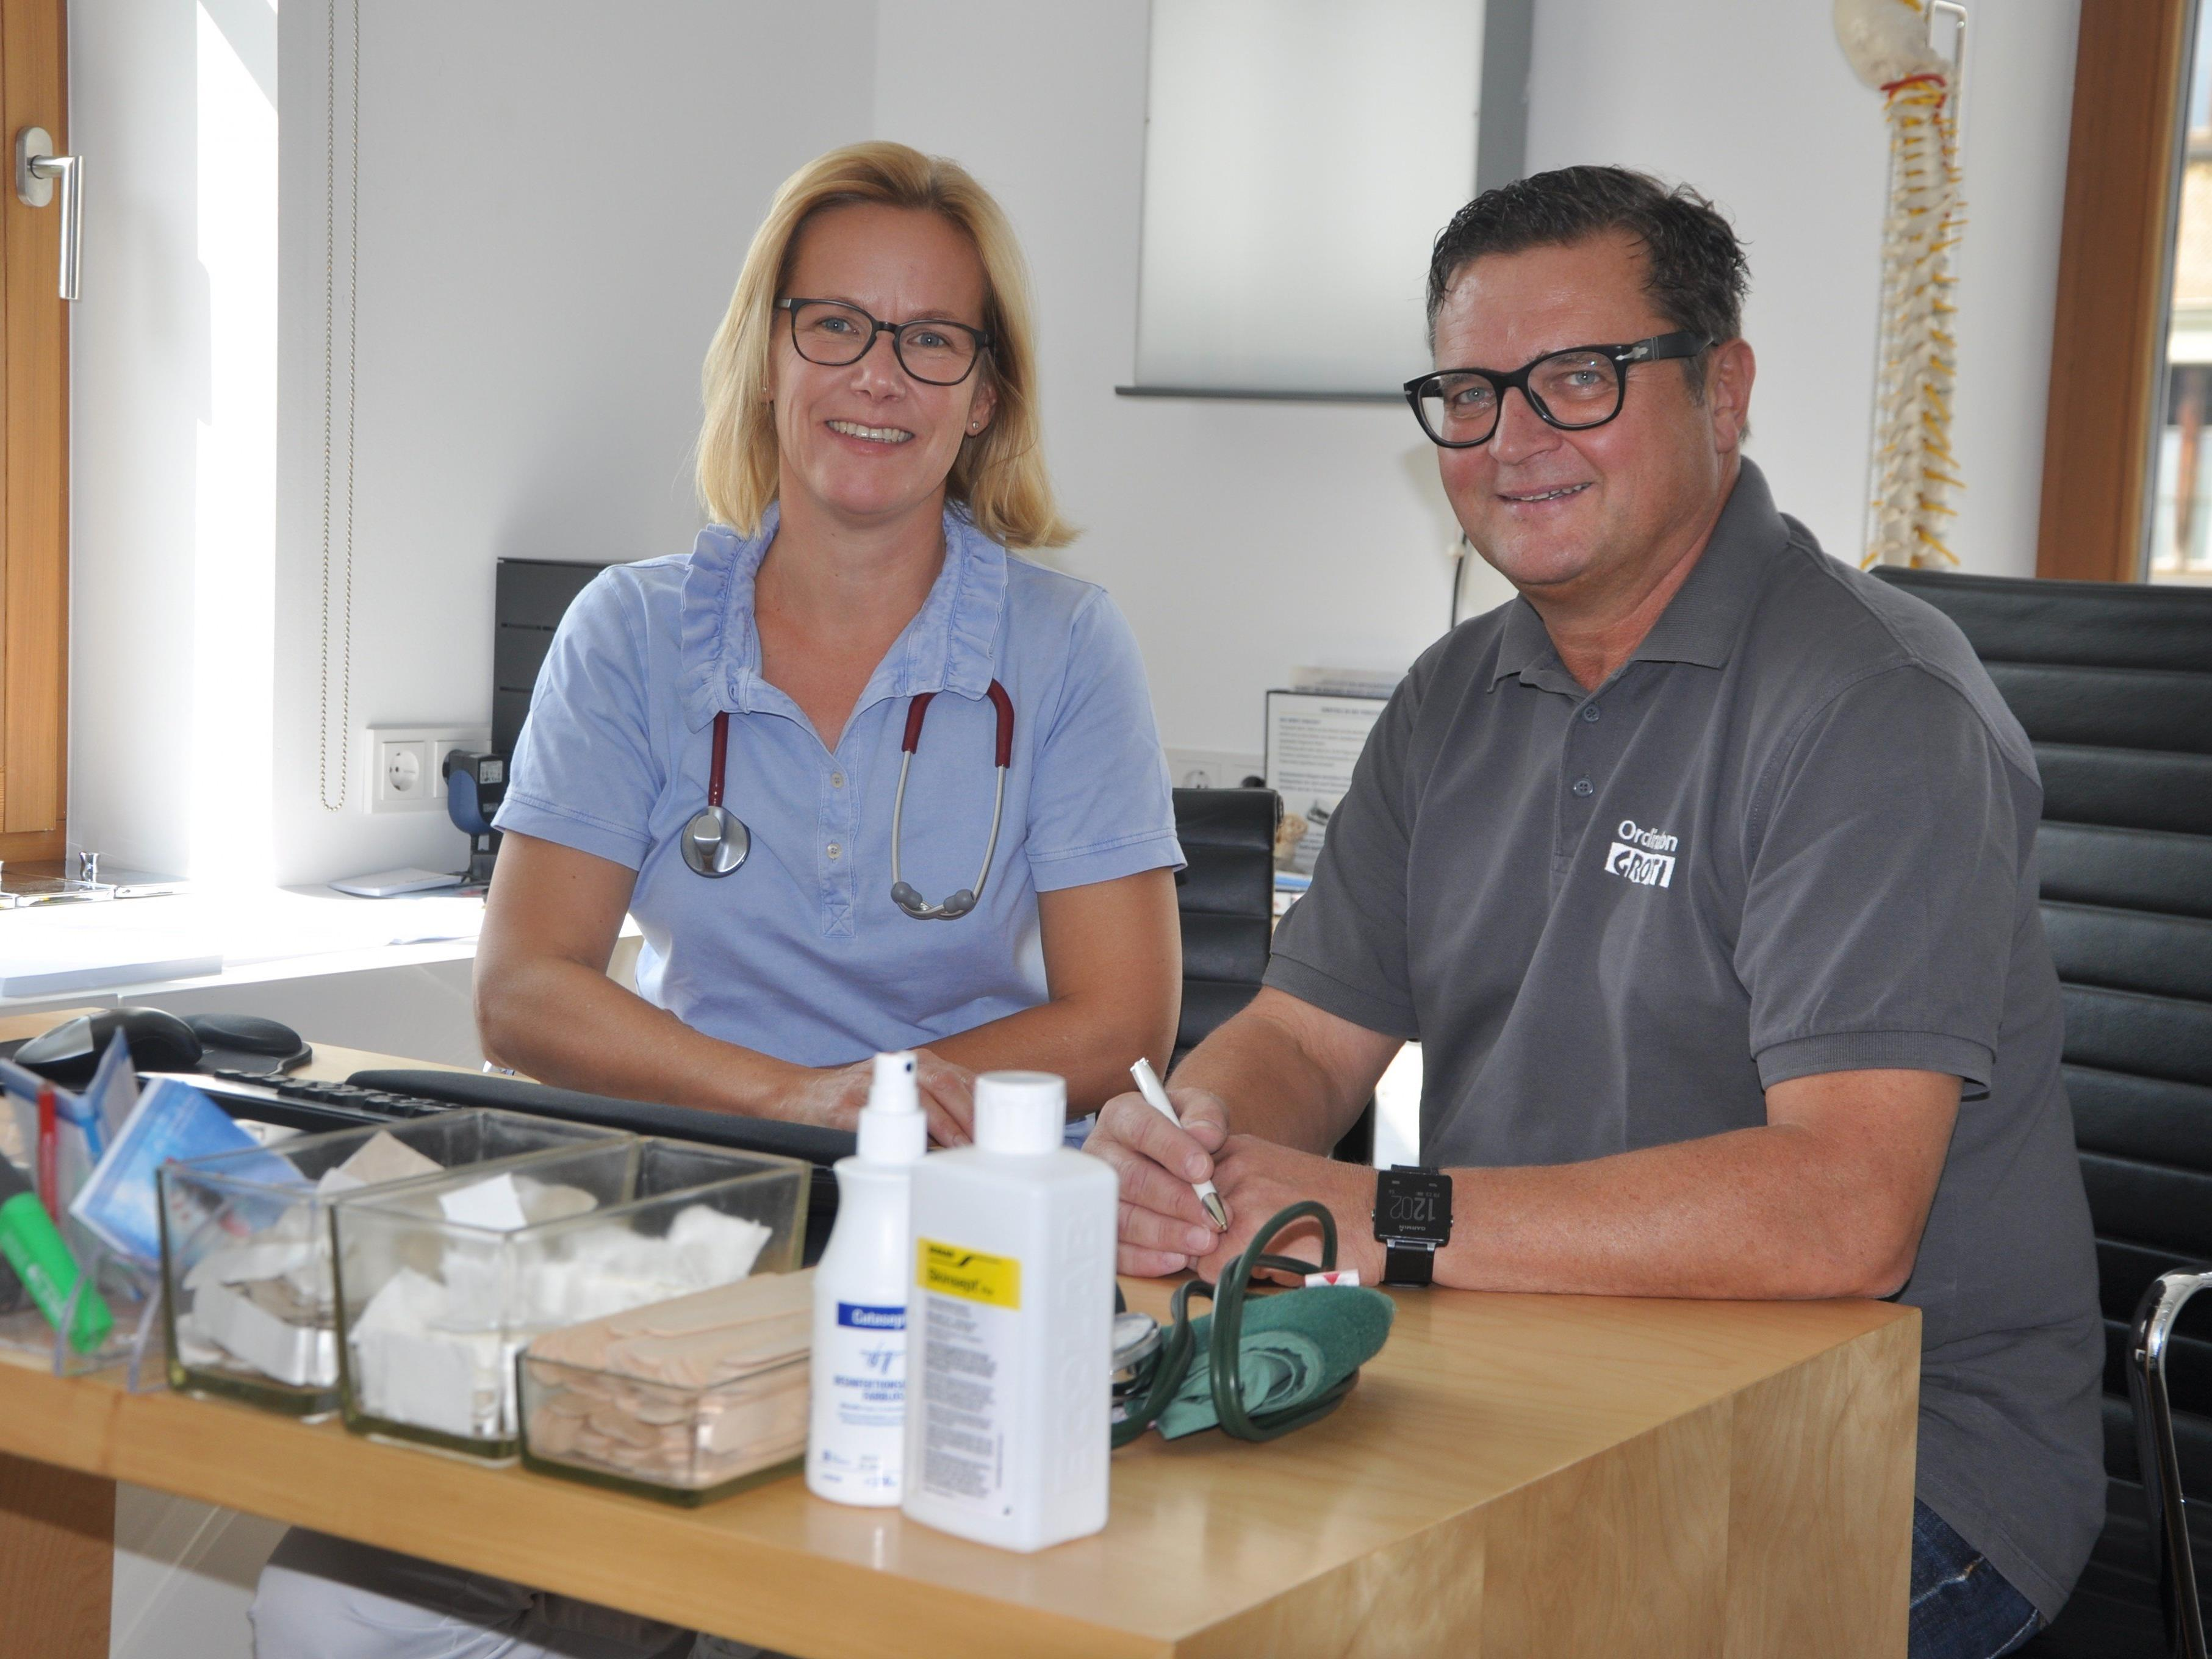 Ab 01. Oktober  - Ärztepartnerschaft Dr. Karl-Heinz Grotti  - Dr. Susanne Linder